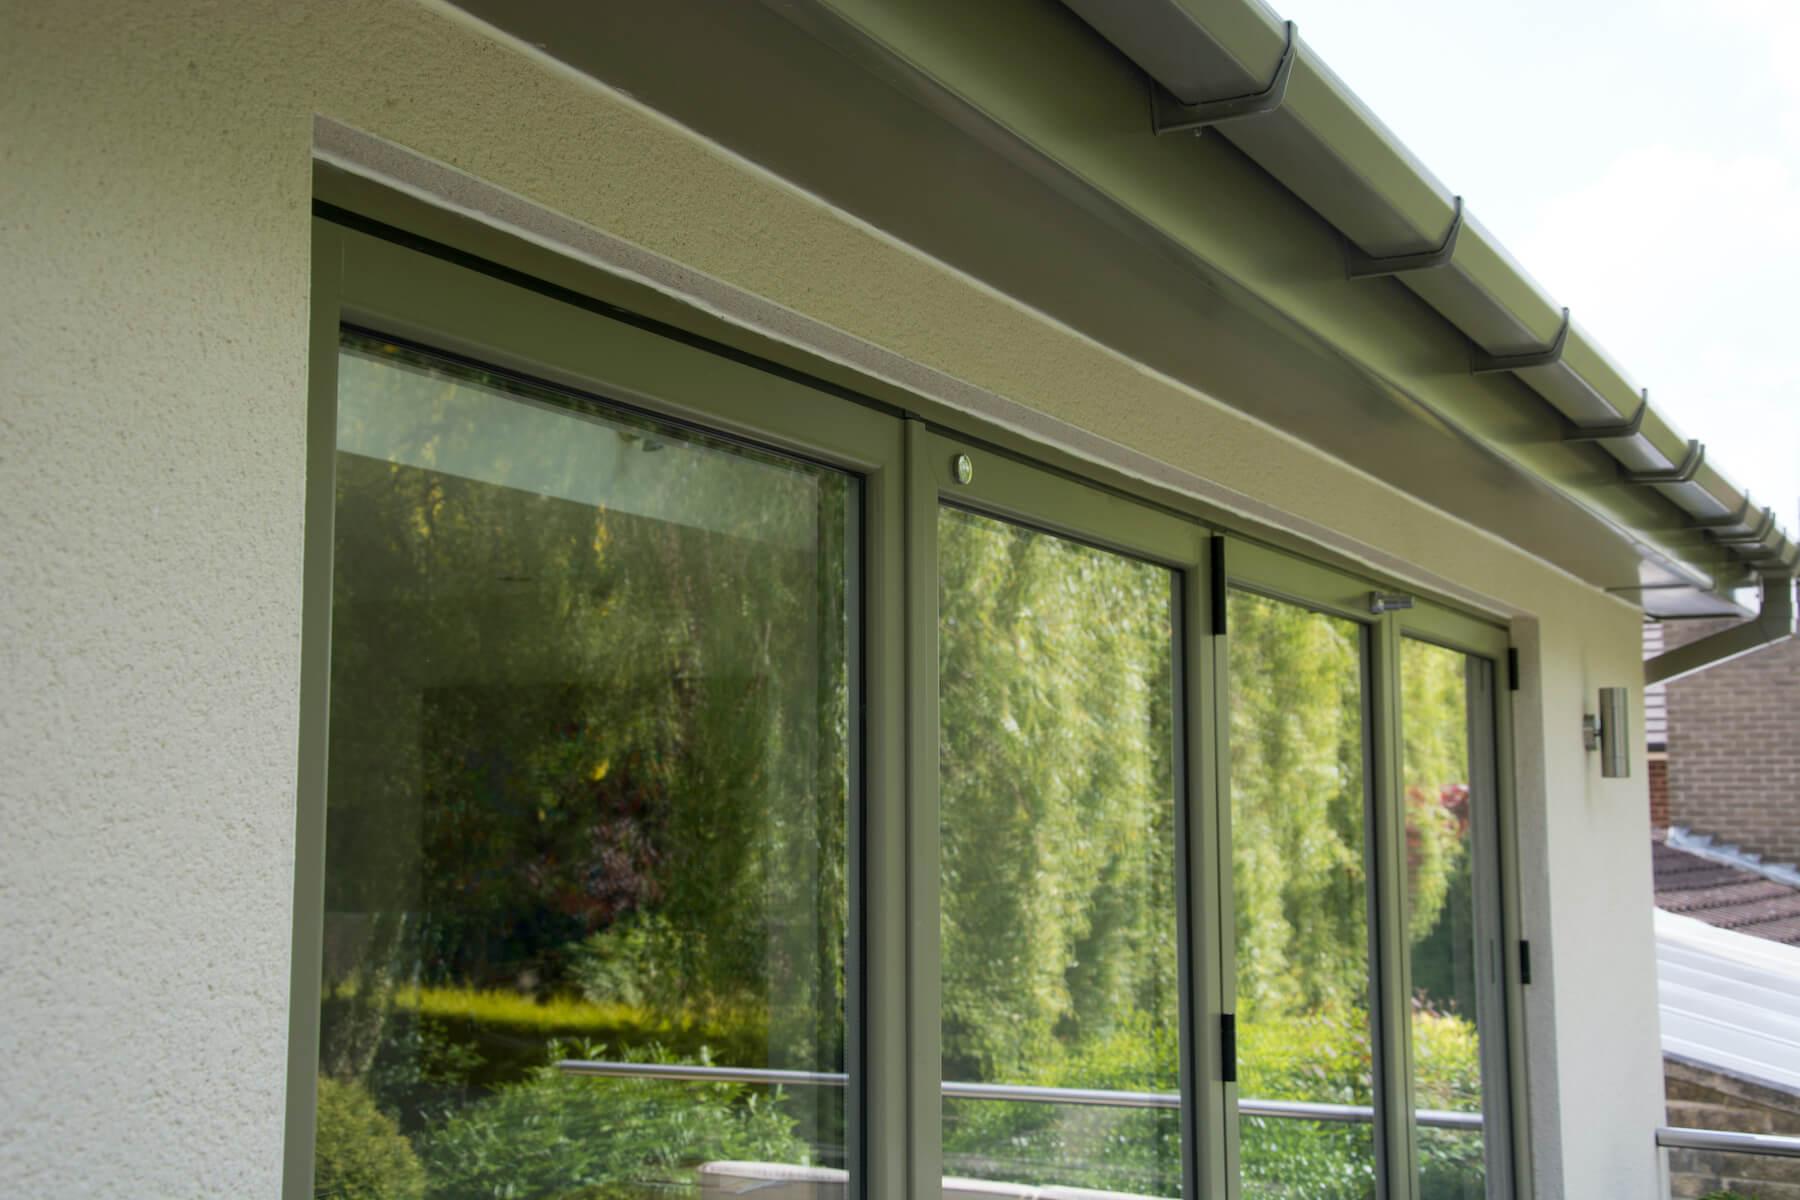 Roofline on conservatory